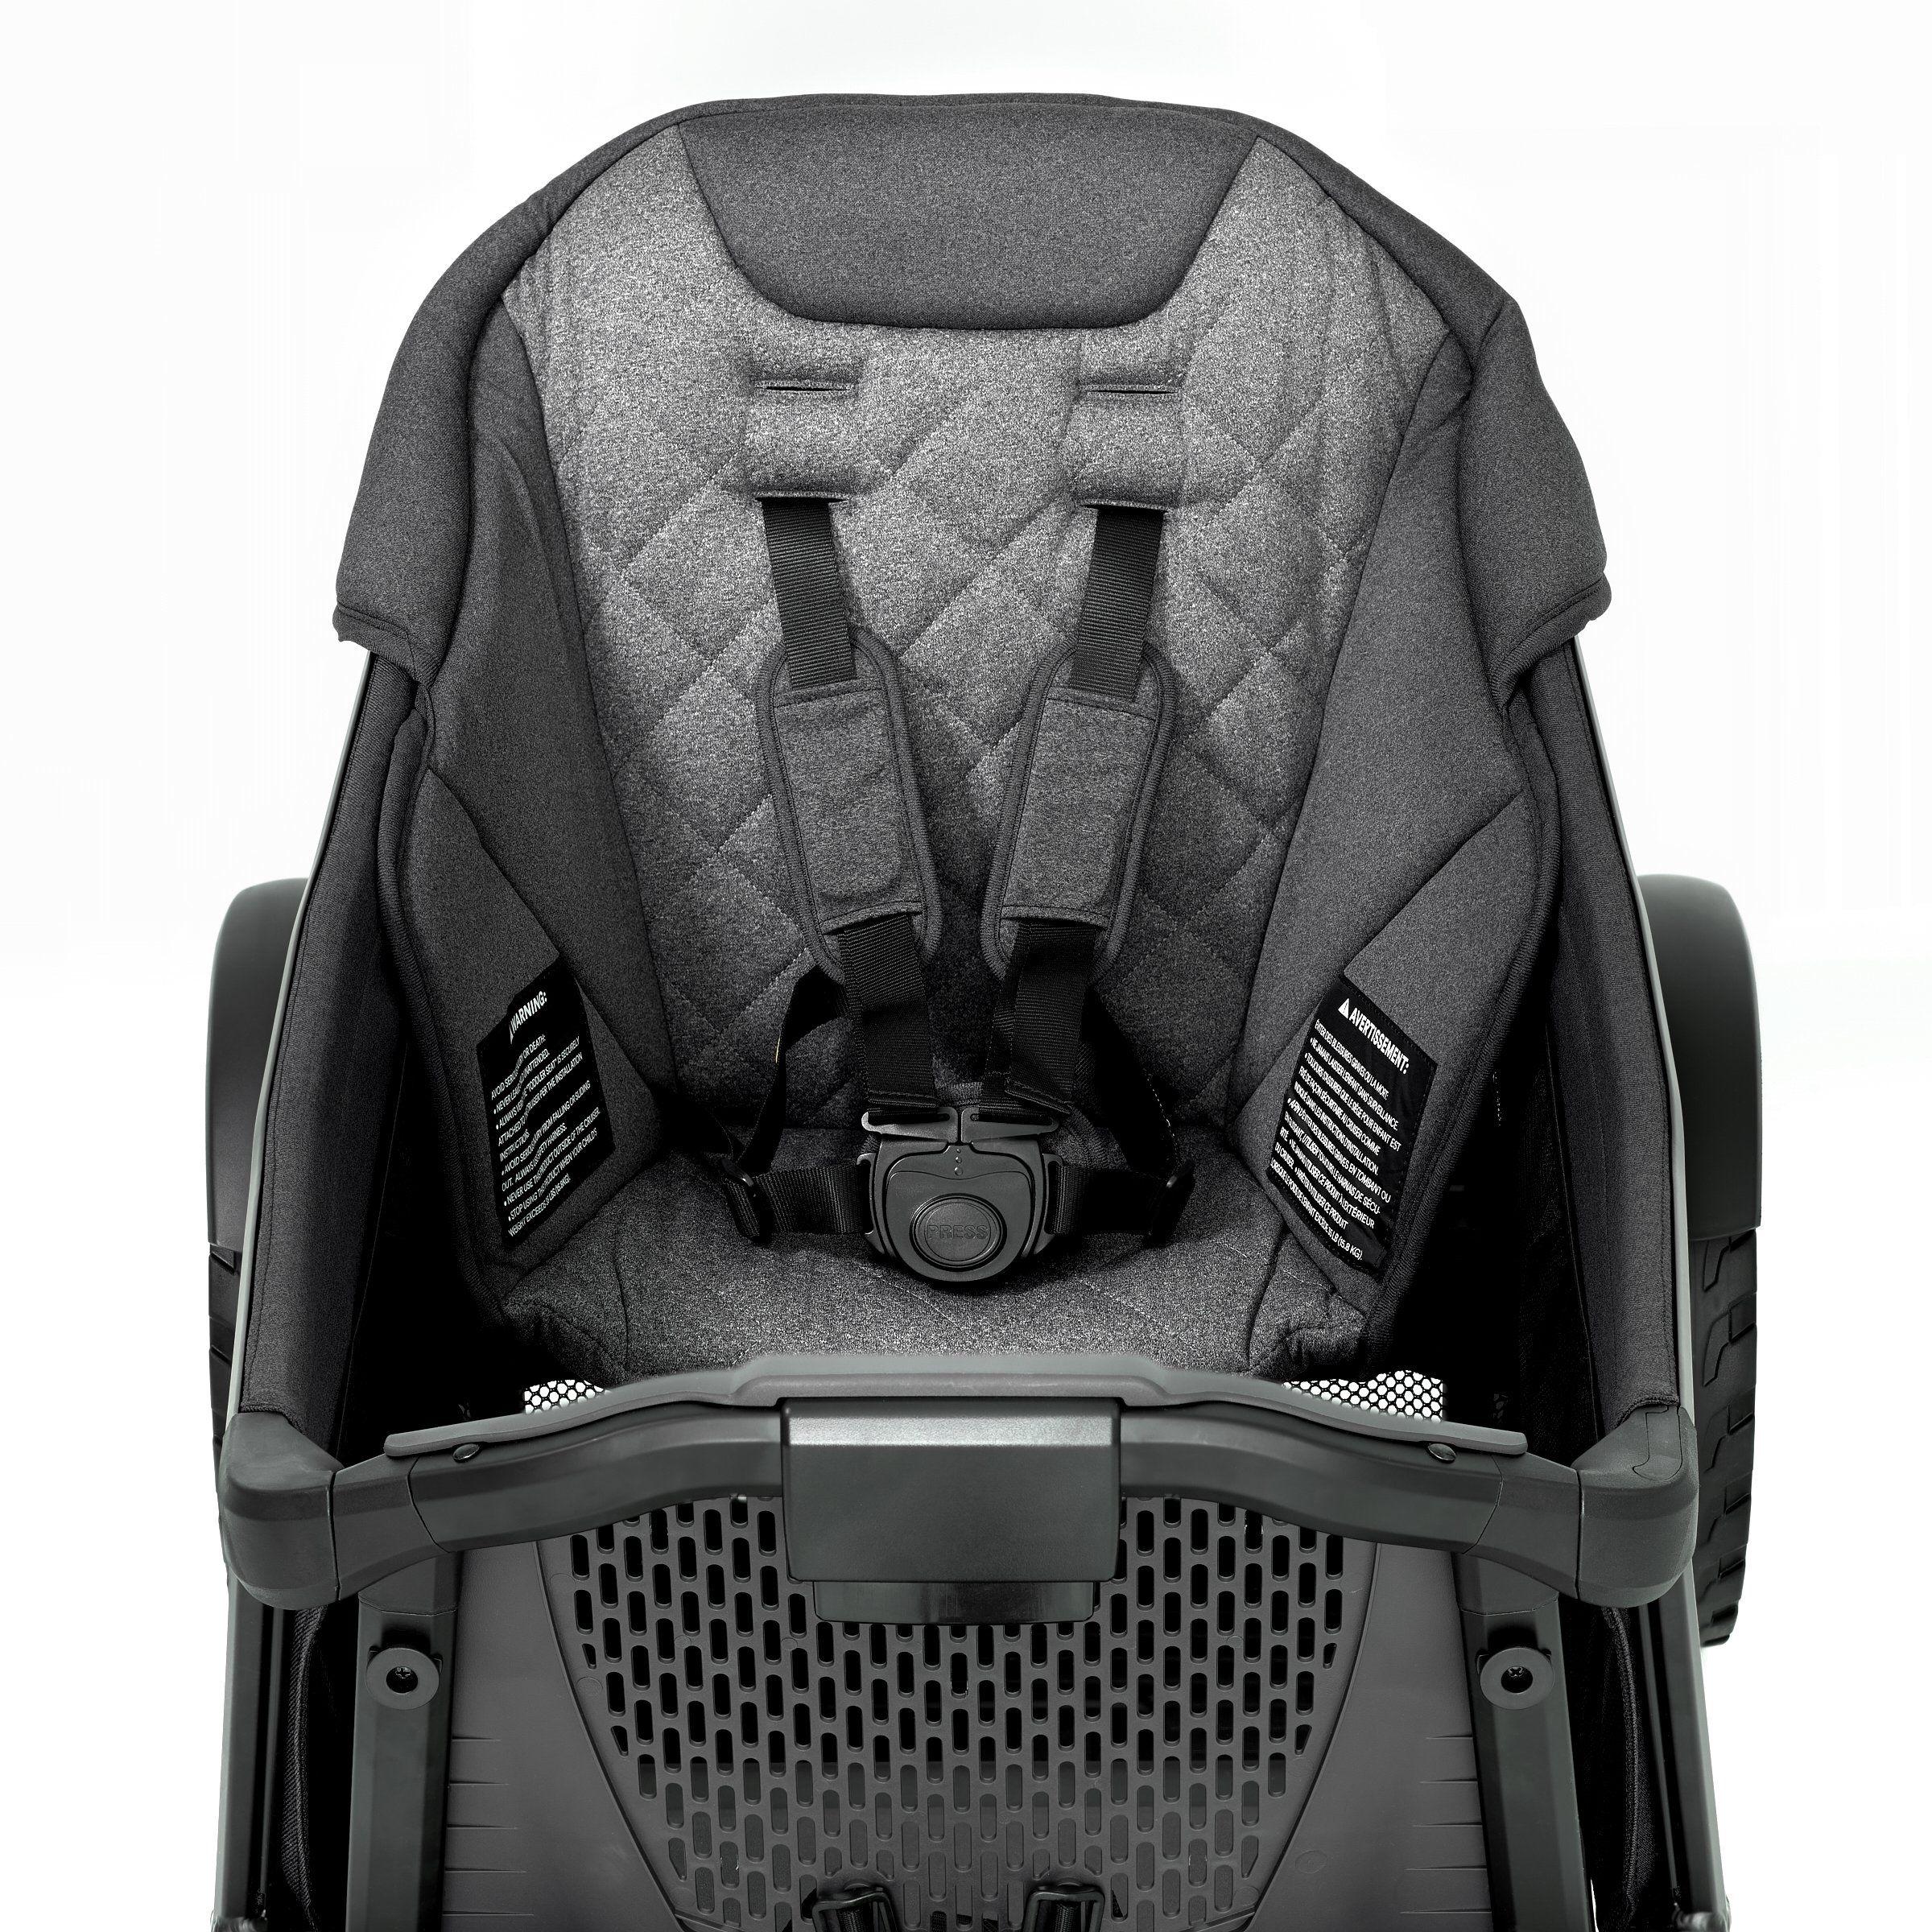 Veer Cruiser Stroller Wagon Comfort Seat for Toddler